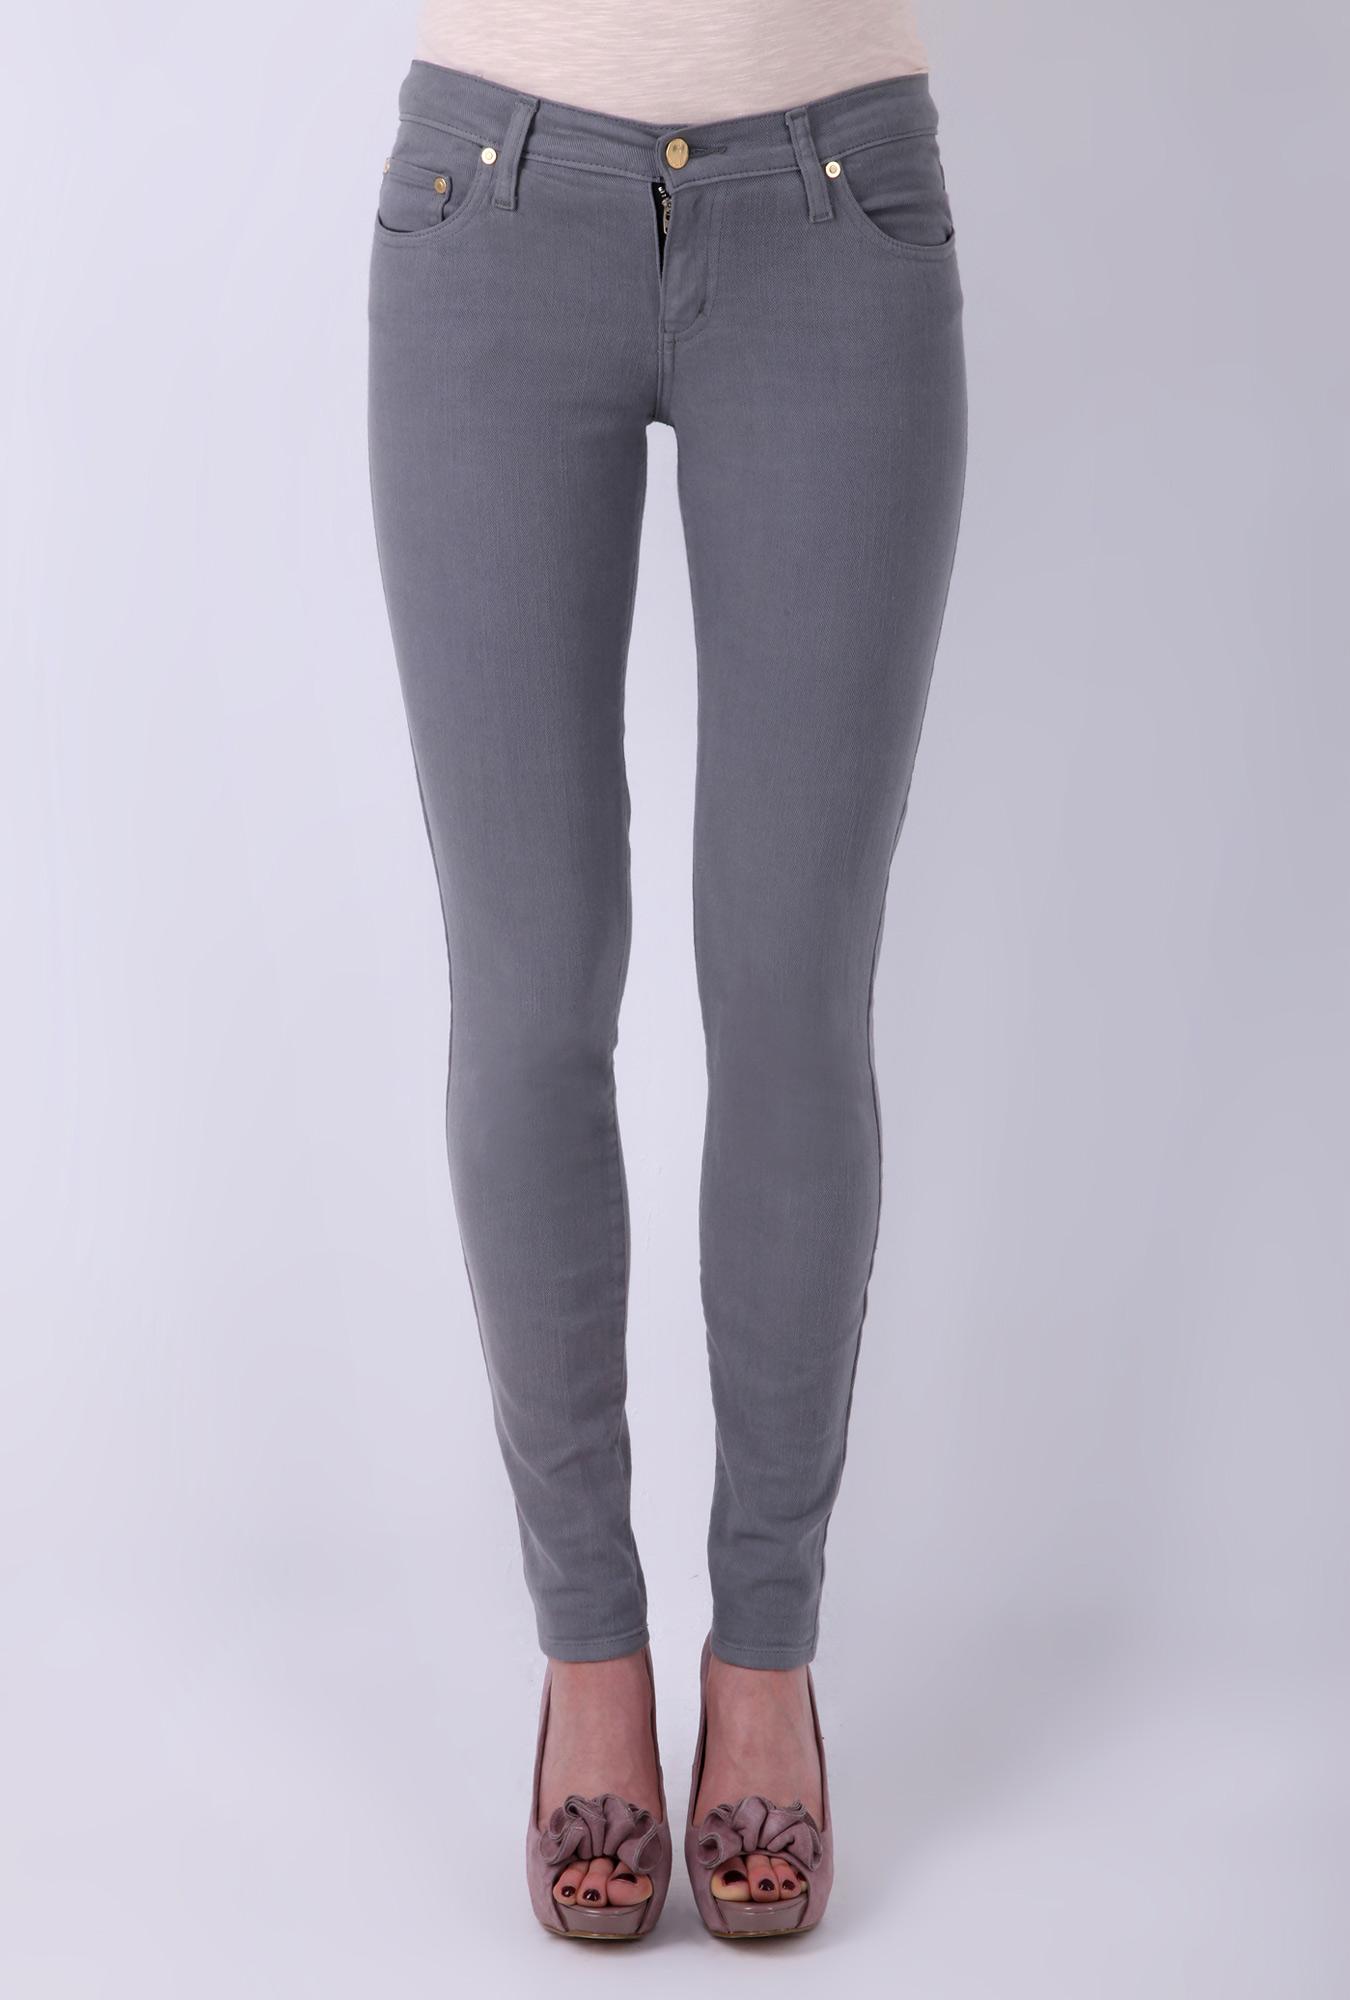 Grey mod straight slim mid rise jean by nobody denim